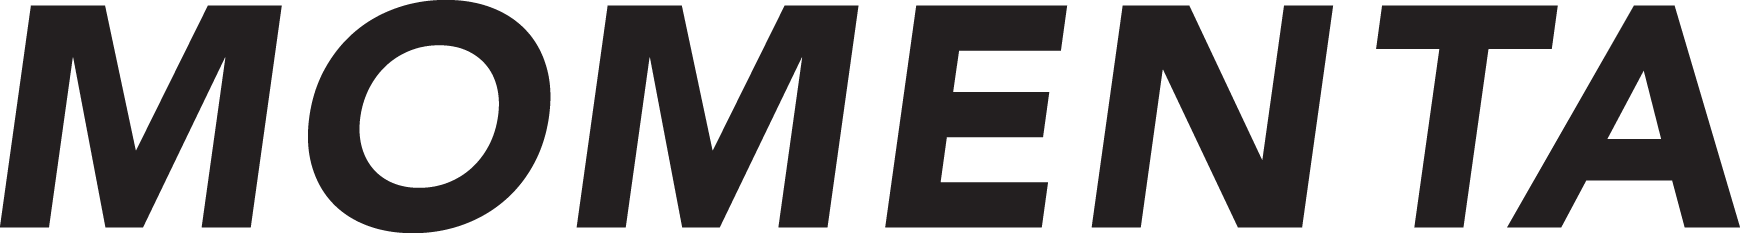 MOMENTA_logo.png